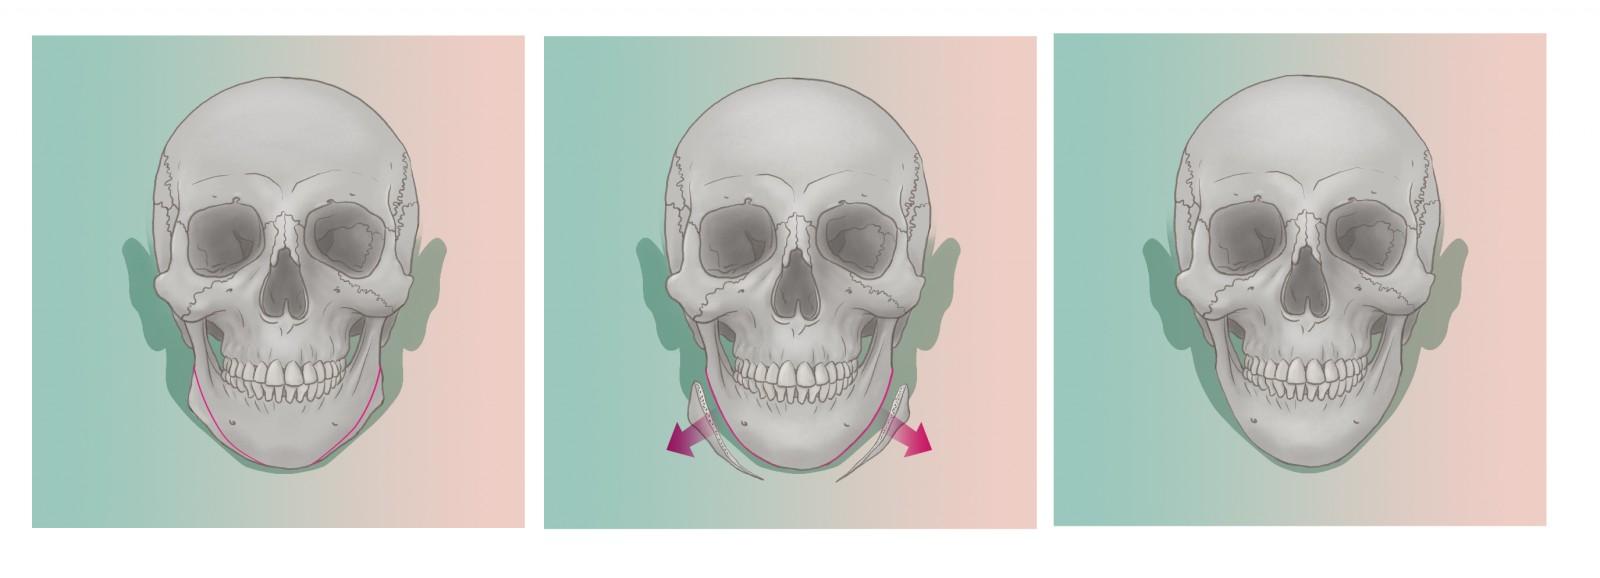 2passclinic before and after transwomen facial feminization FFS mtf antwerp jaw reduction